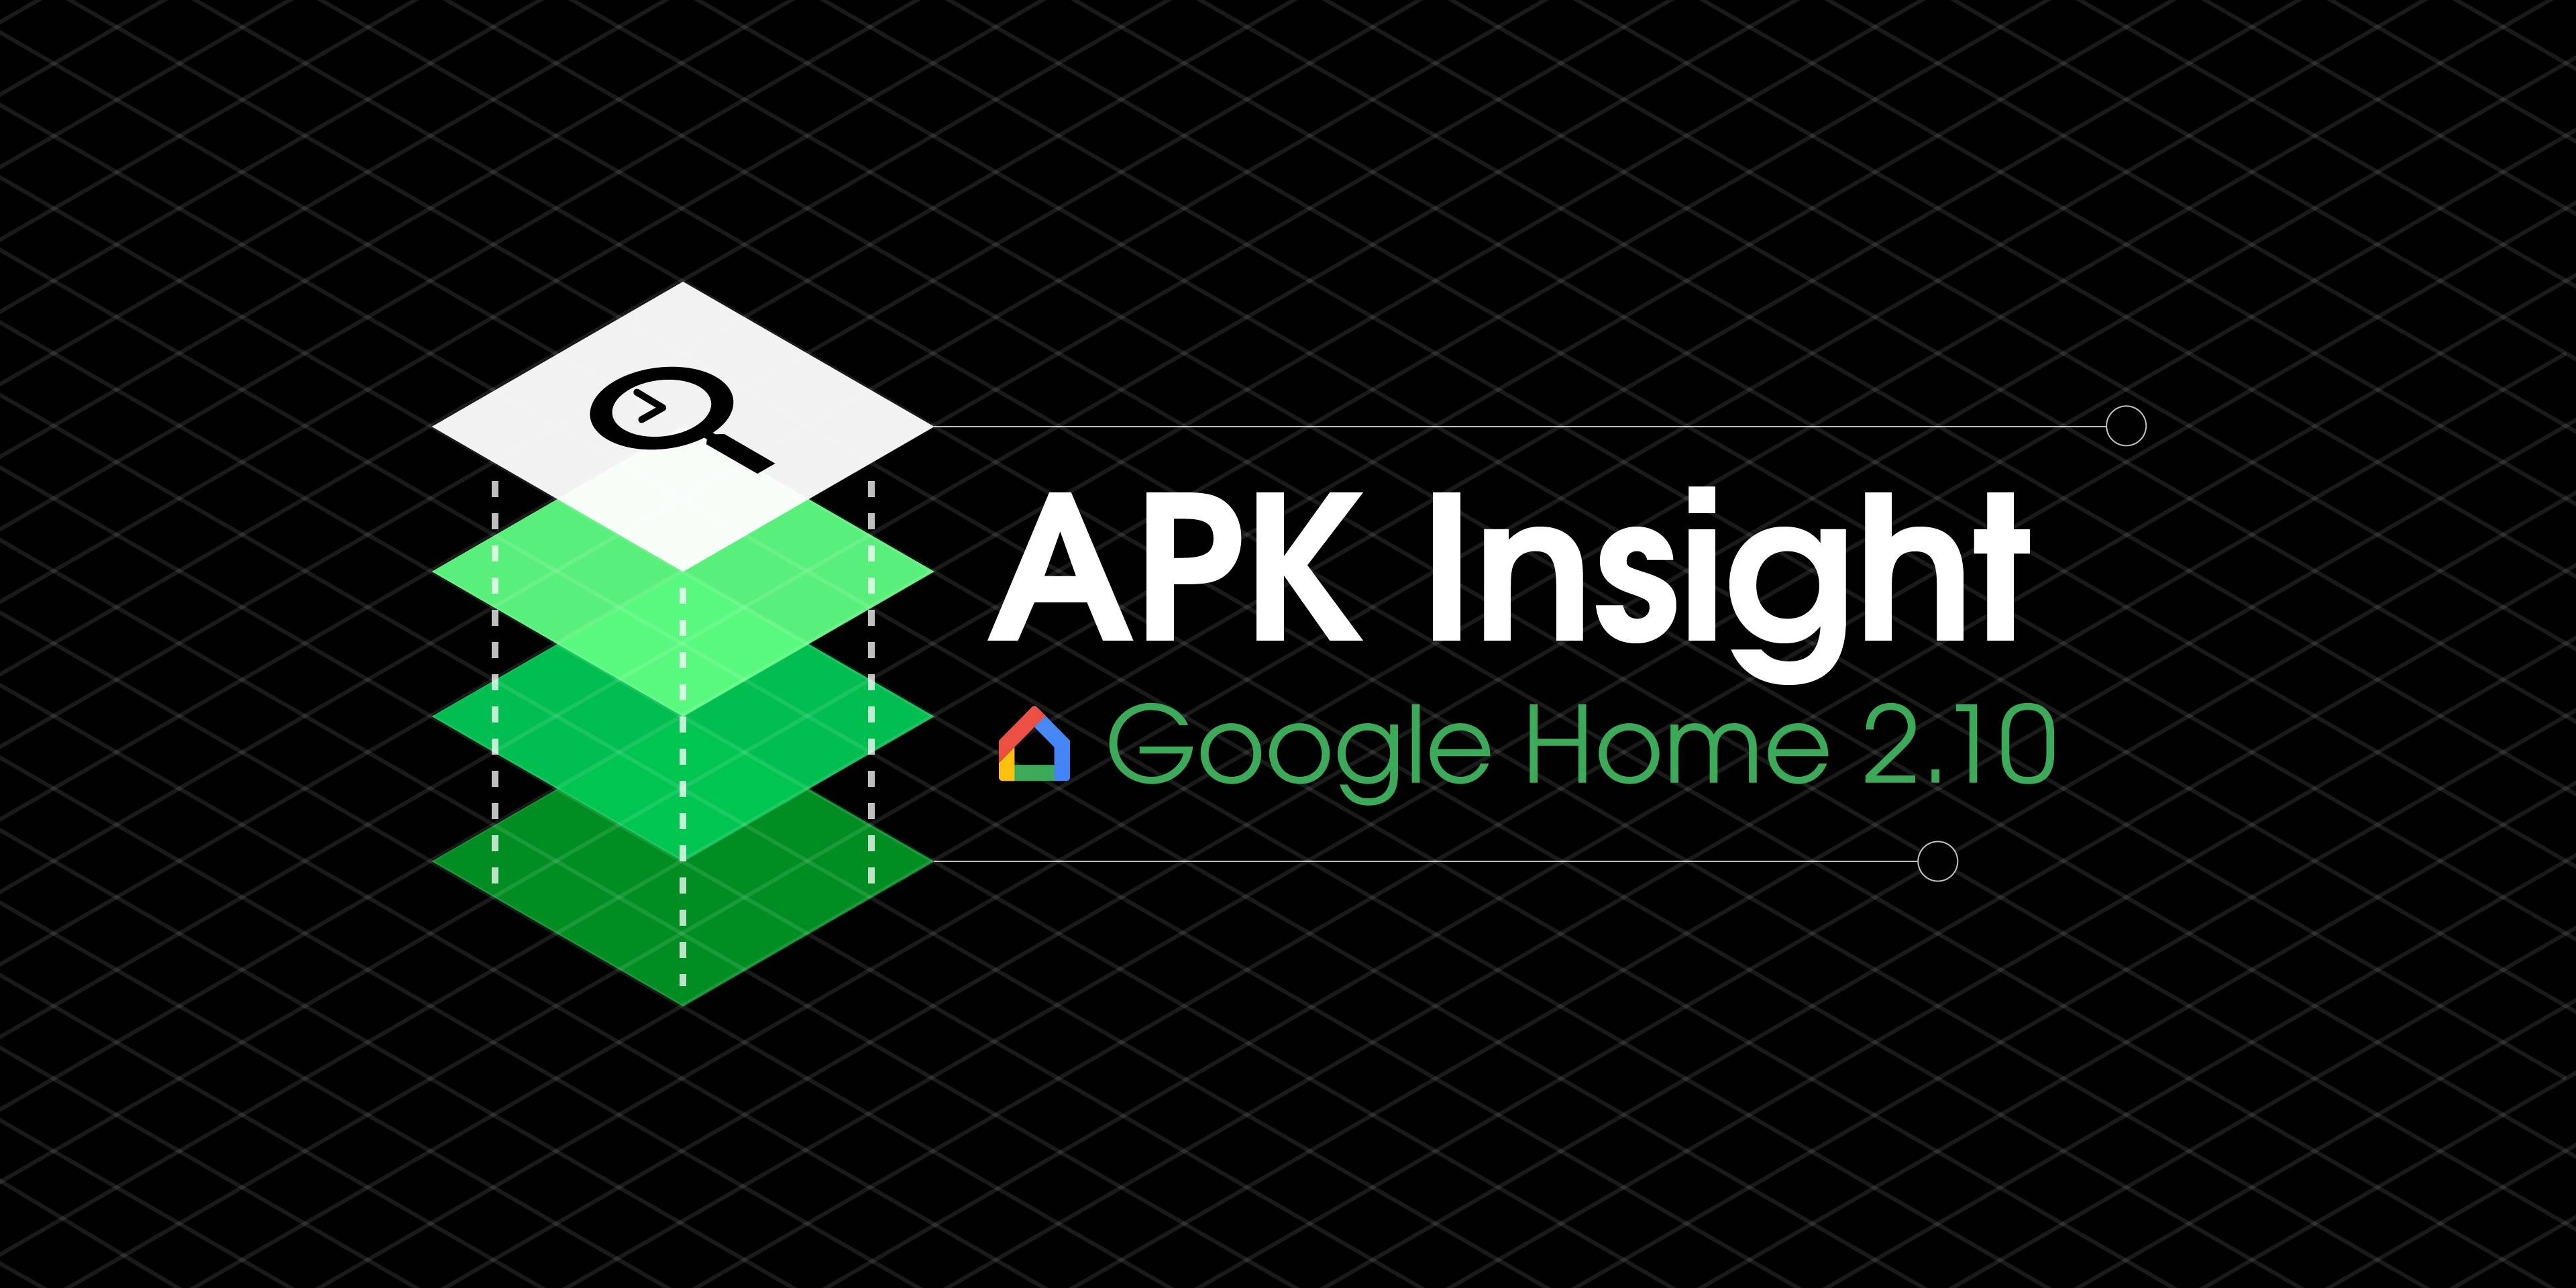 Google Home 2.10 reveals 'border router' w/ smart plug codenamed 'Zion' and 'Speaker V' [APK Insight]